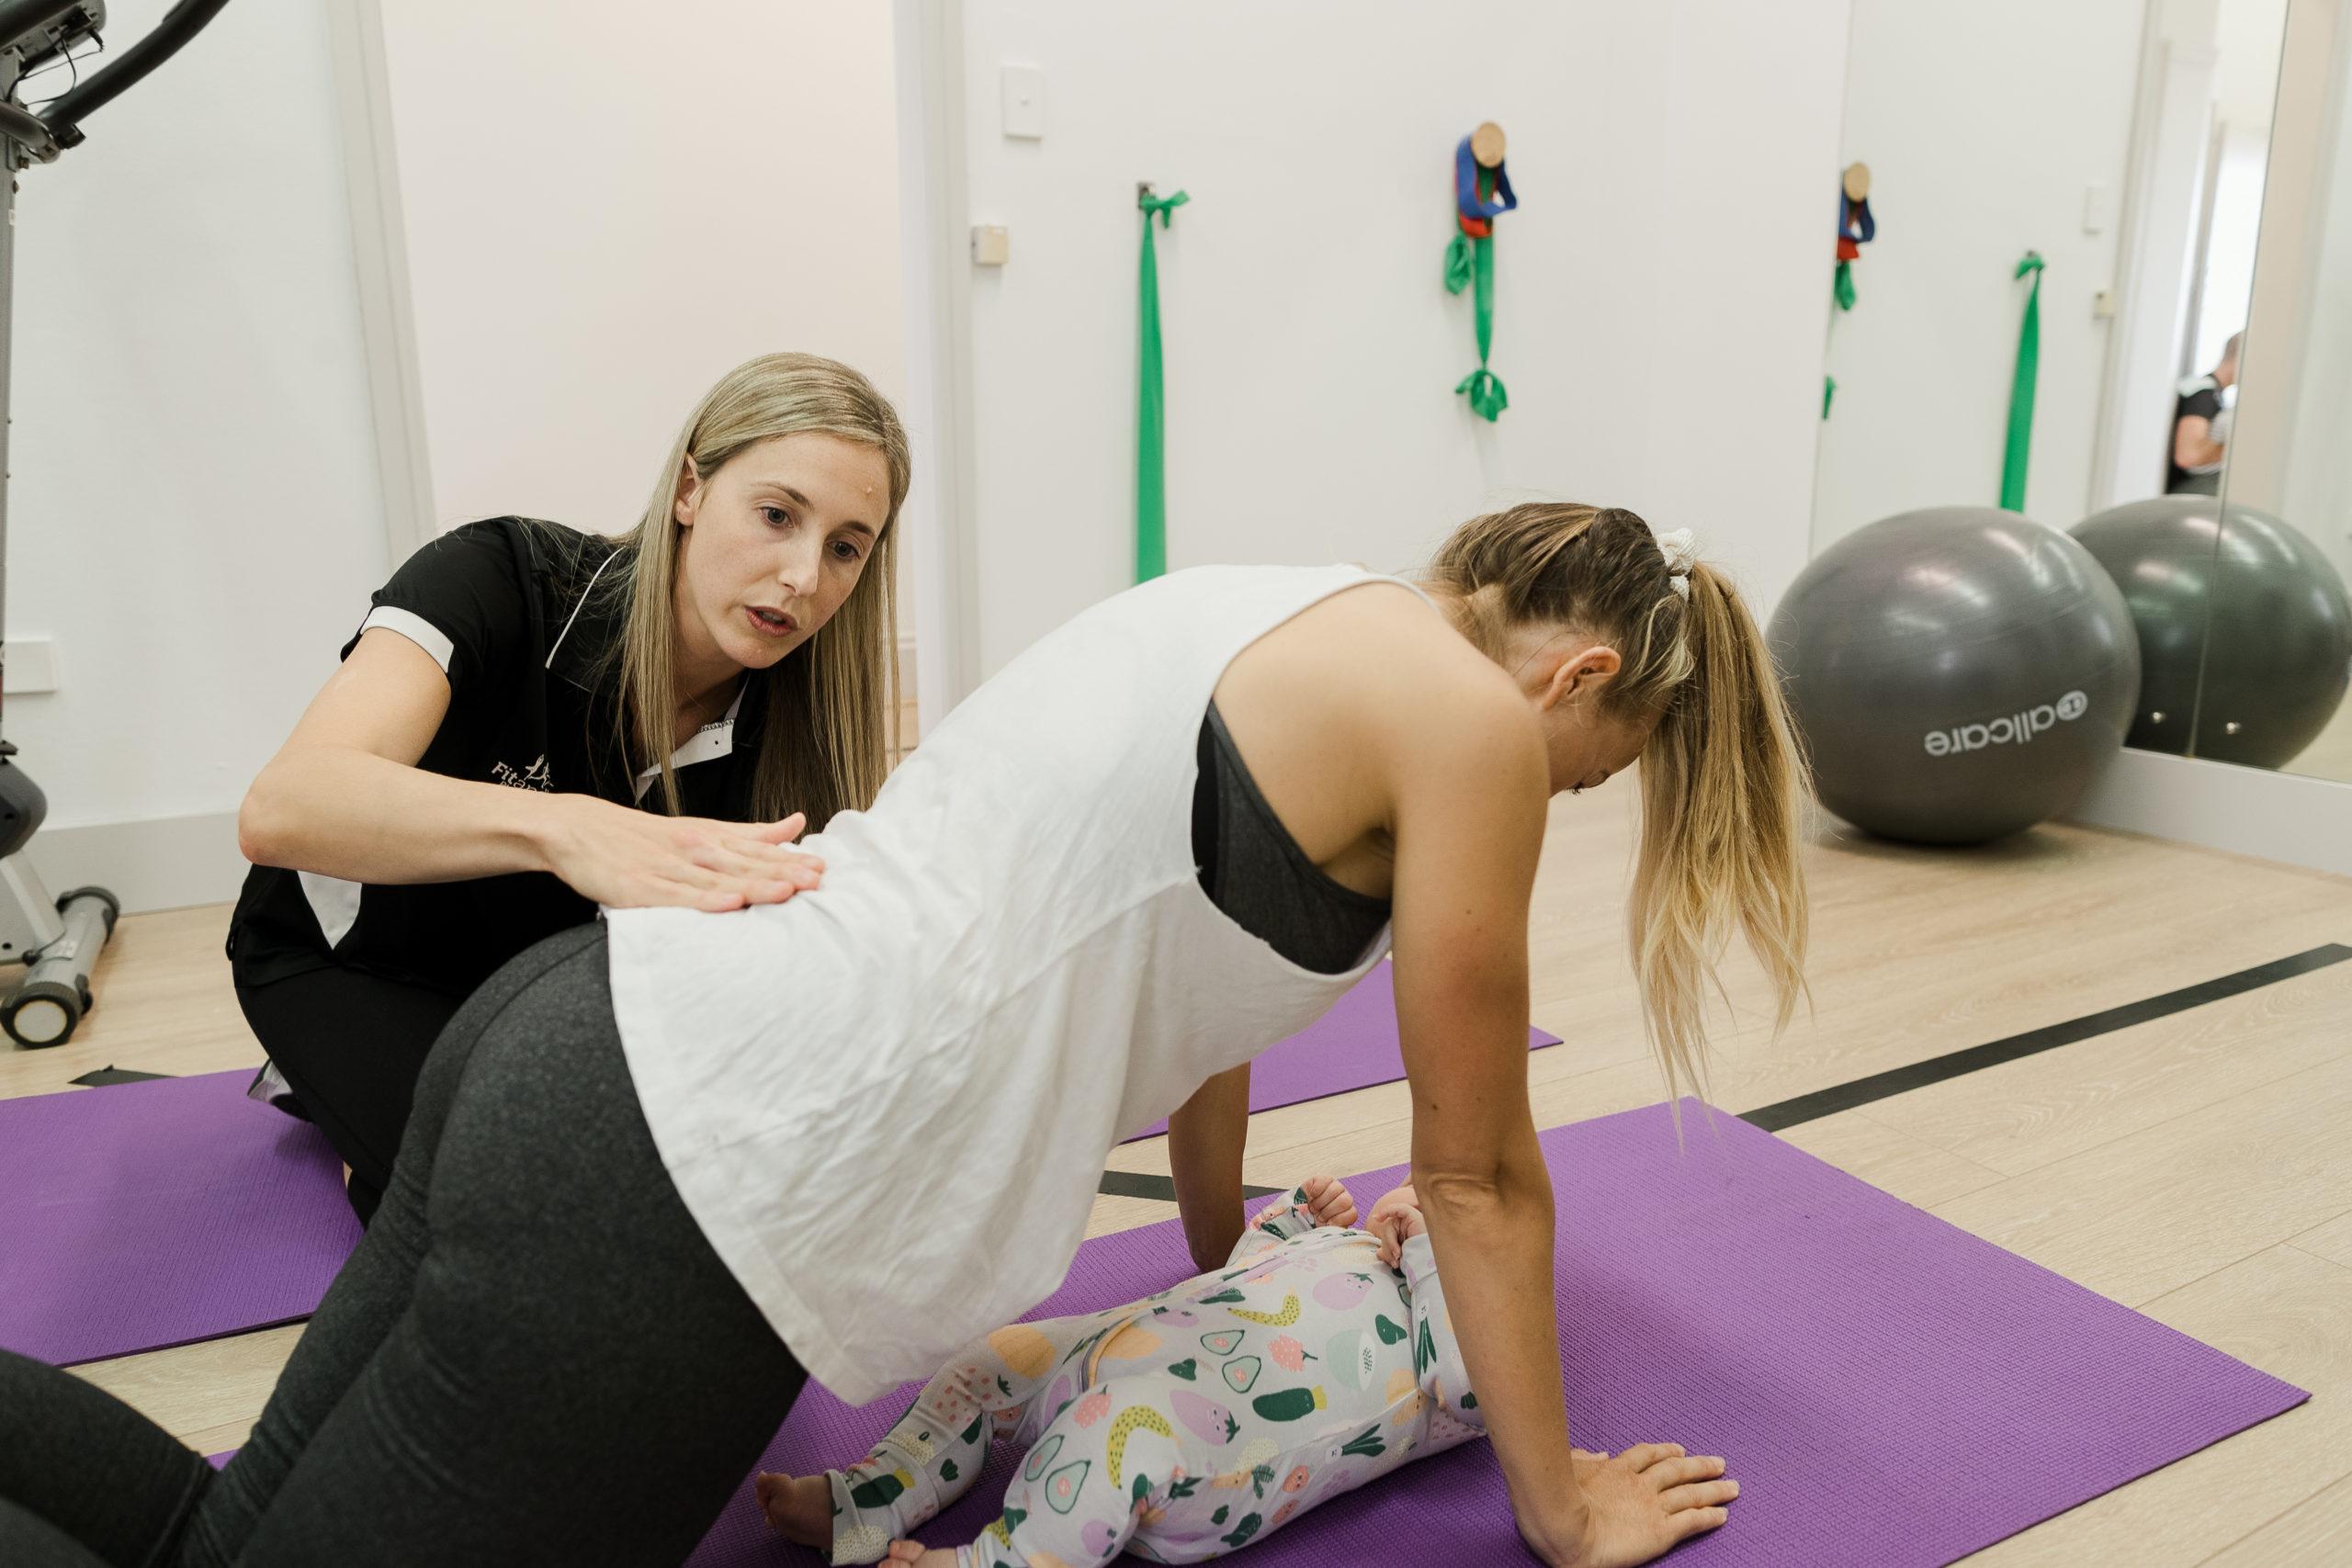 Caringbah Women's Health Physio